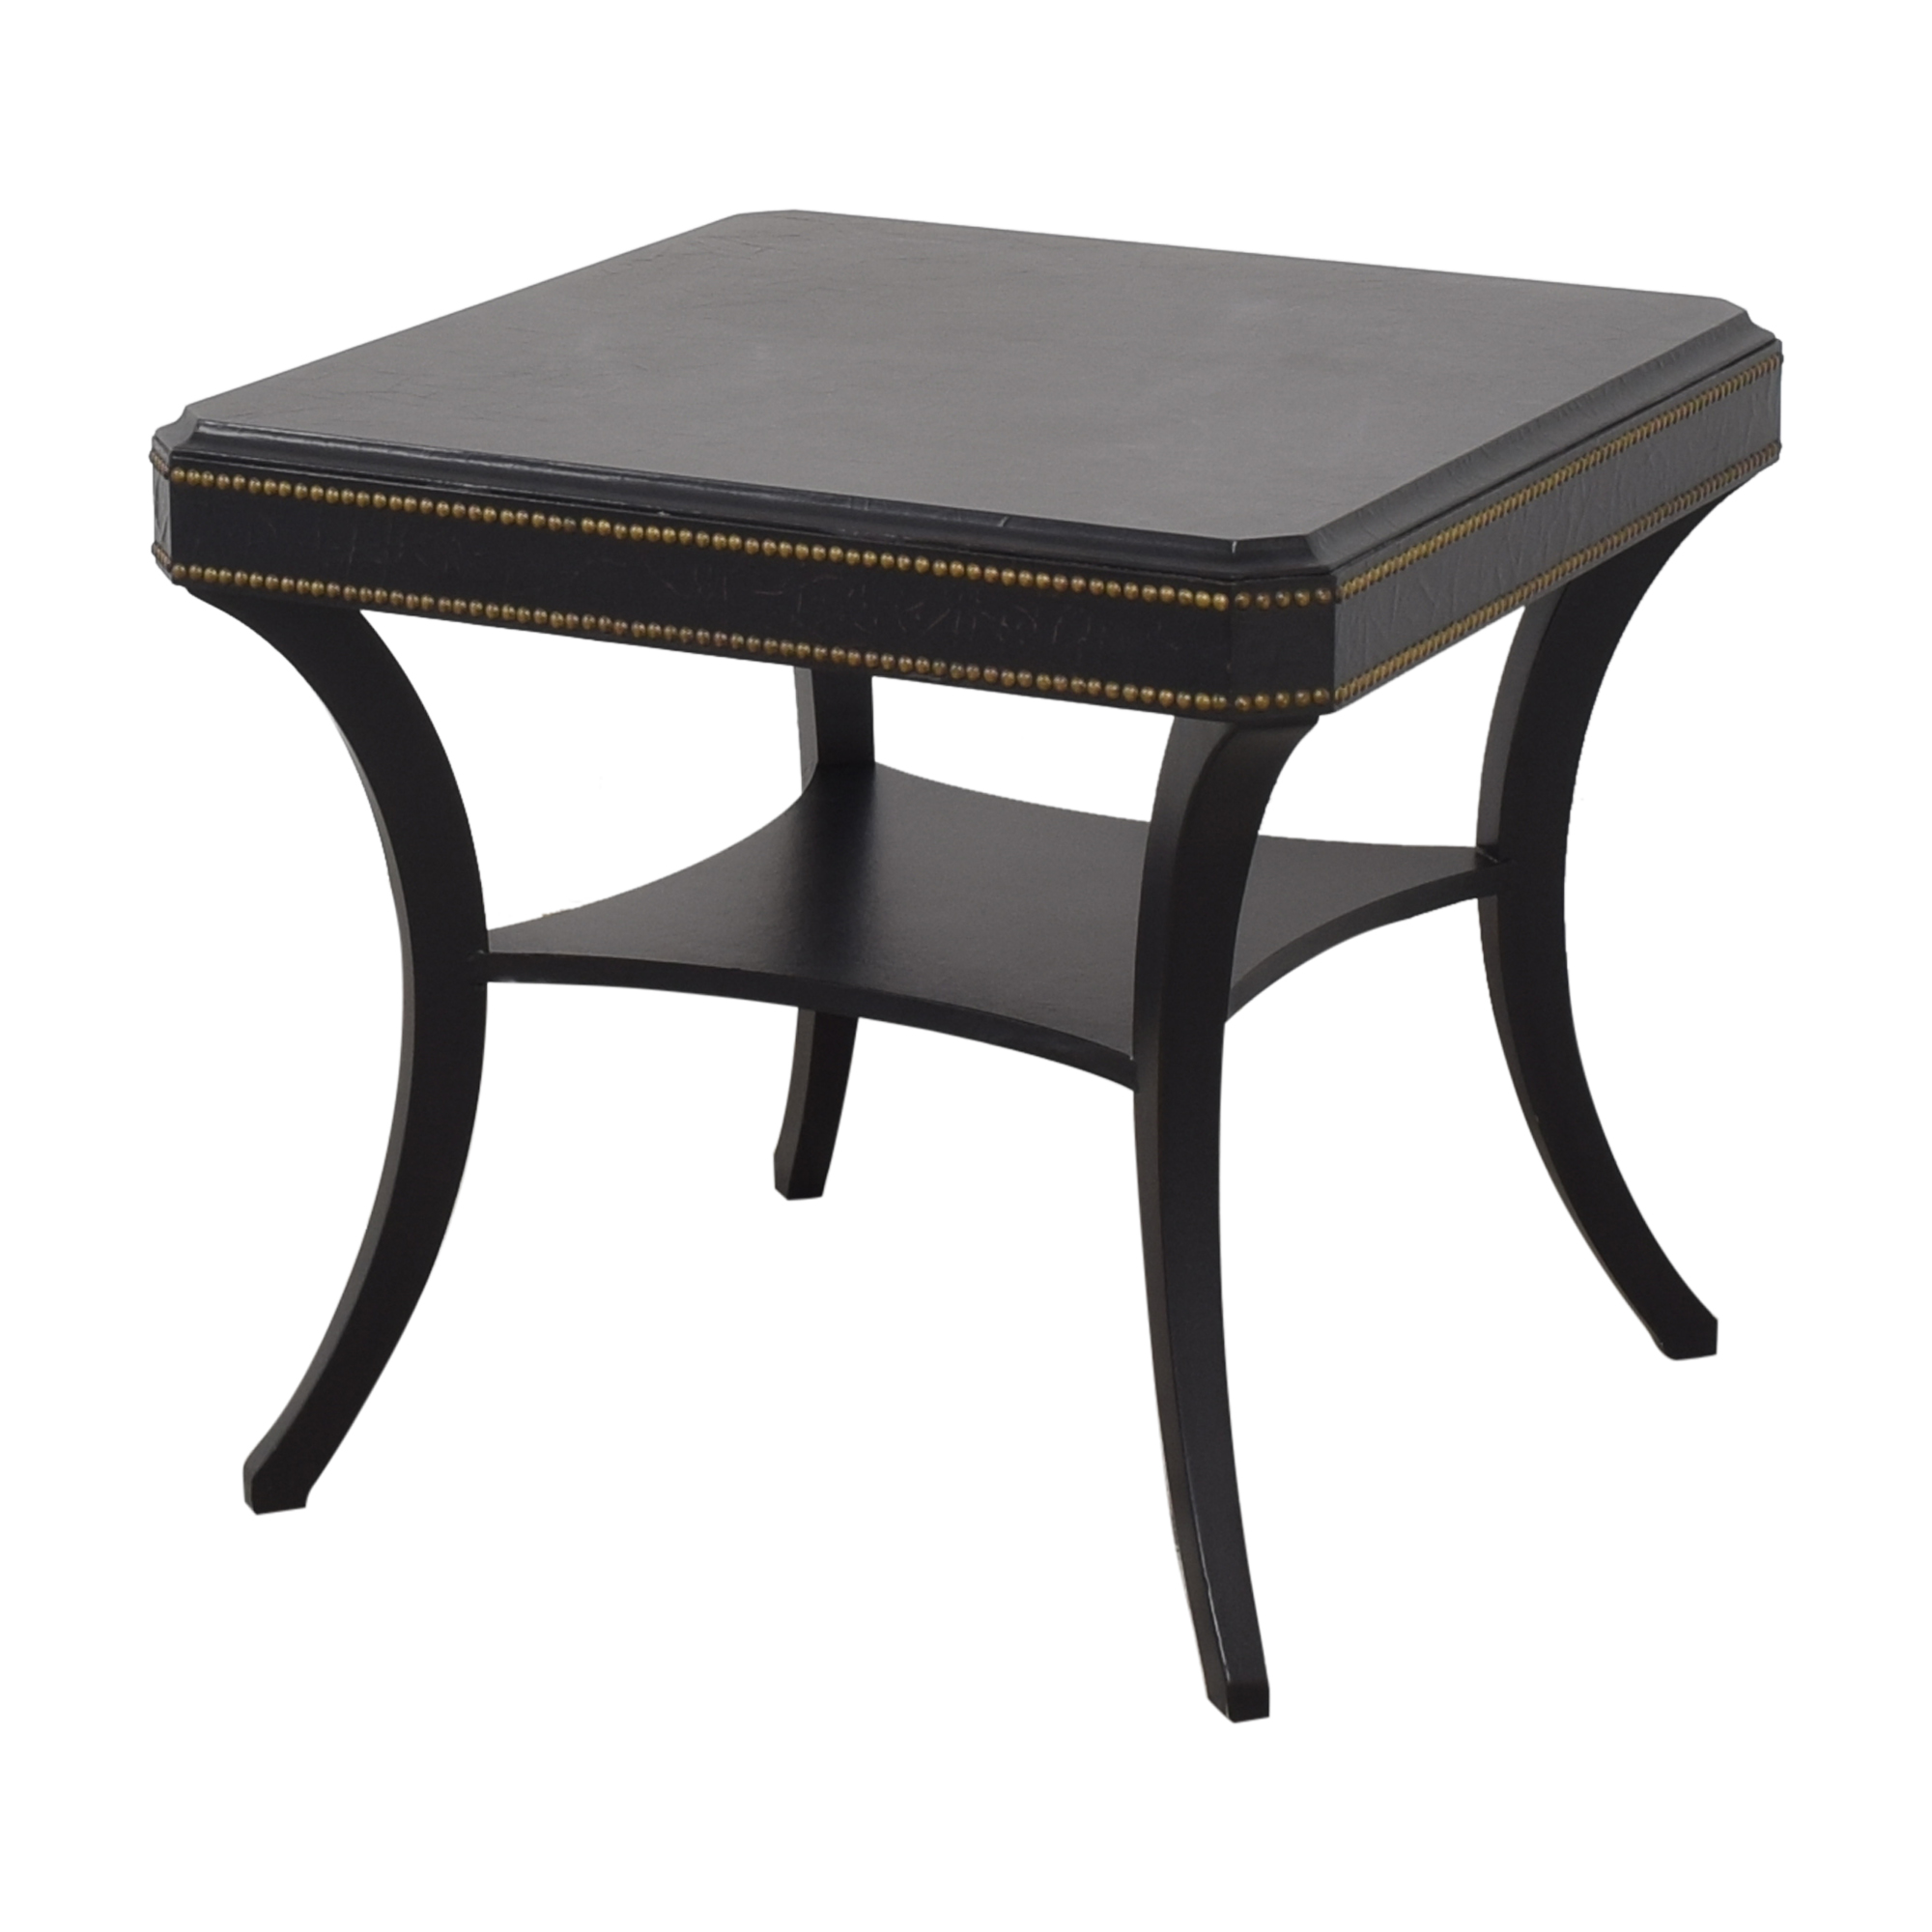 shop Ethan Allen Ethan Allen Everett End Table online